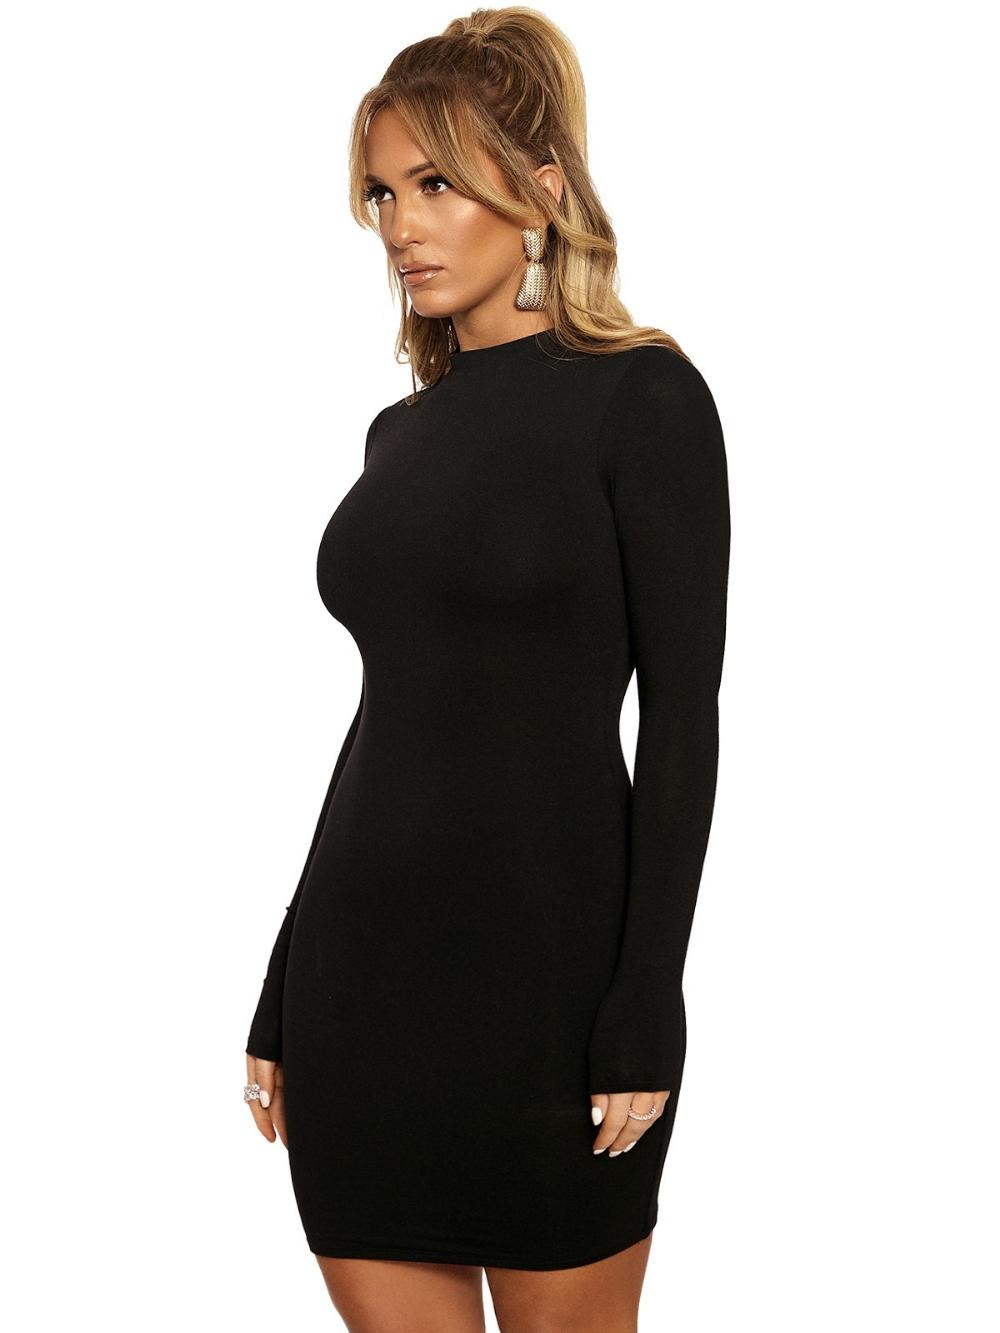 The Nw Mini Black Long Sleeve Dress Long Sleeve Fitted Dress Winter Mini Dresses [ 1333 x 1000 Pixel ]